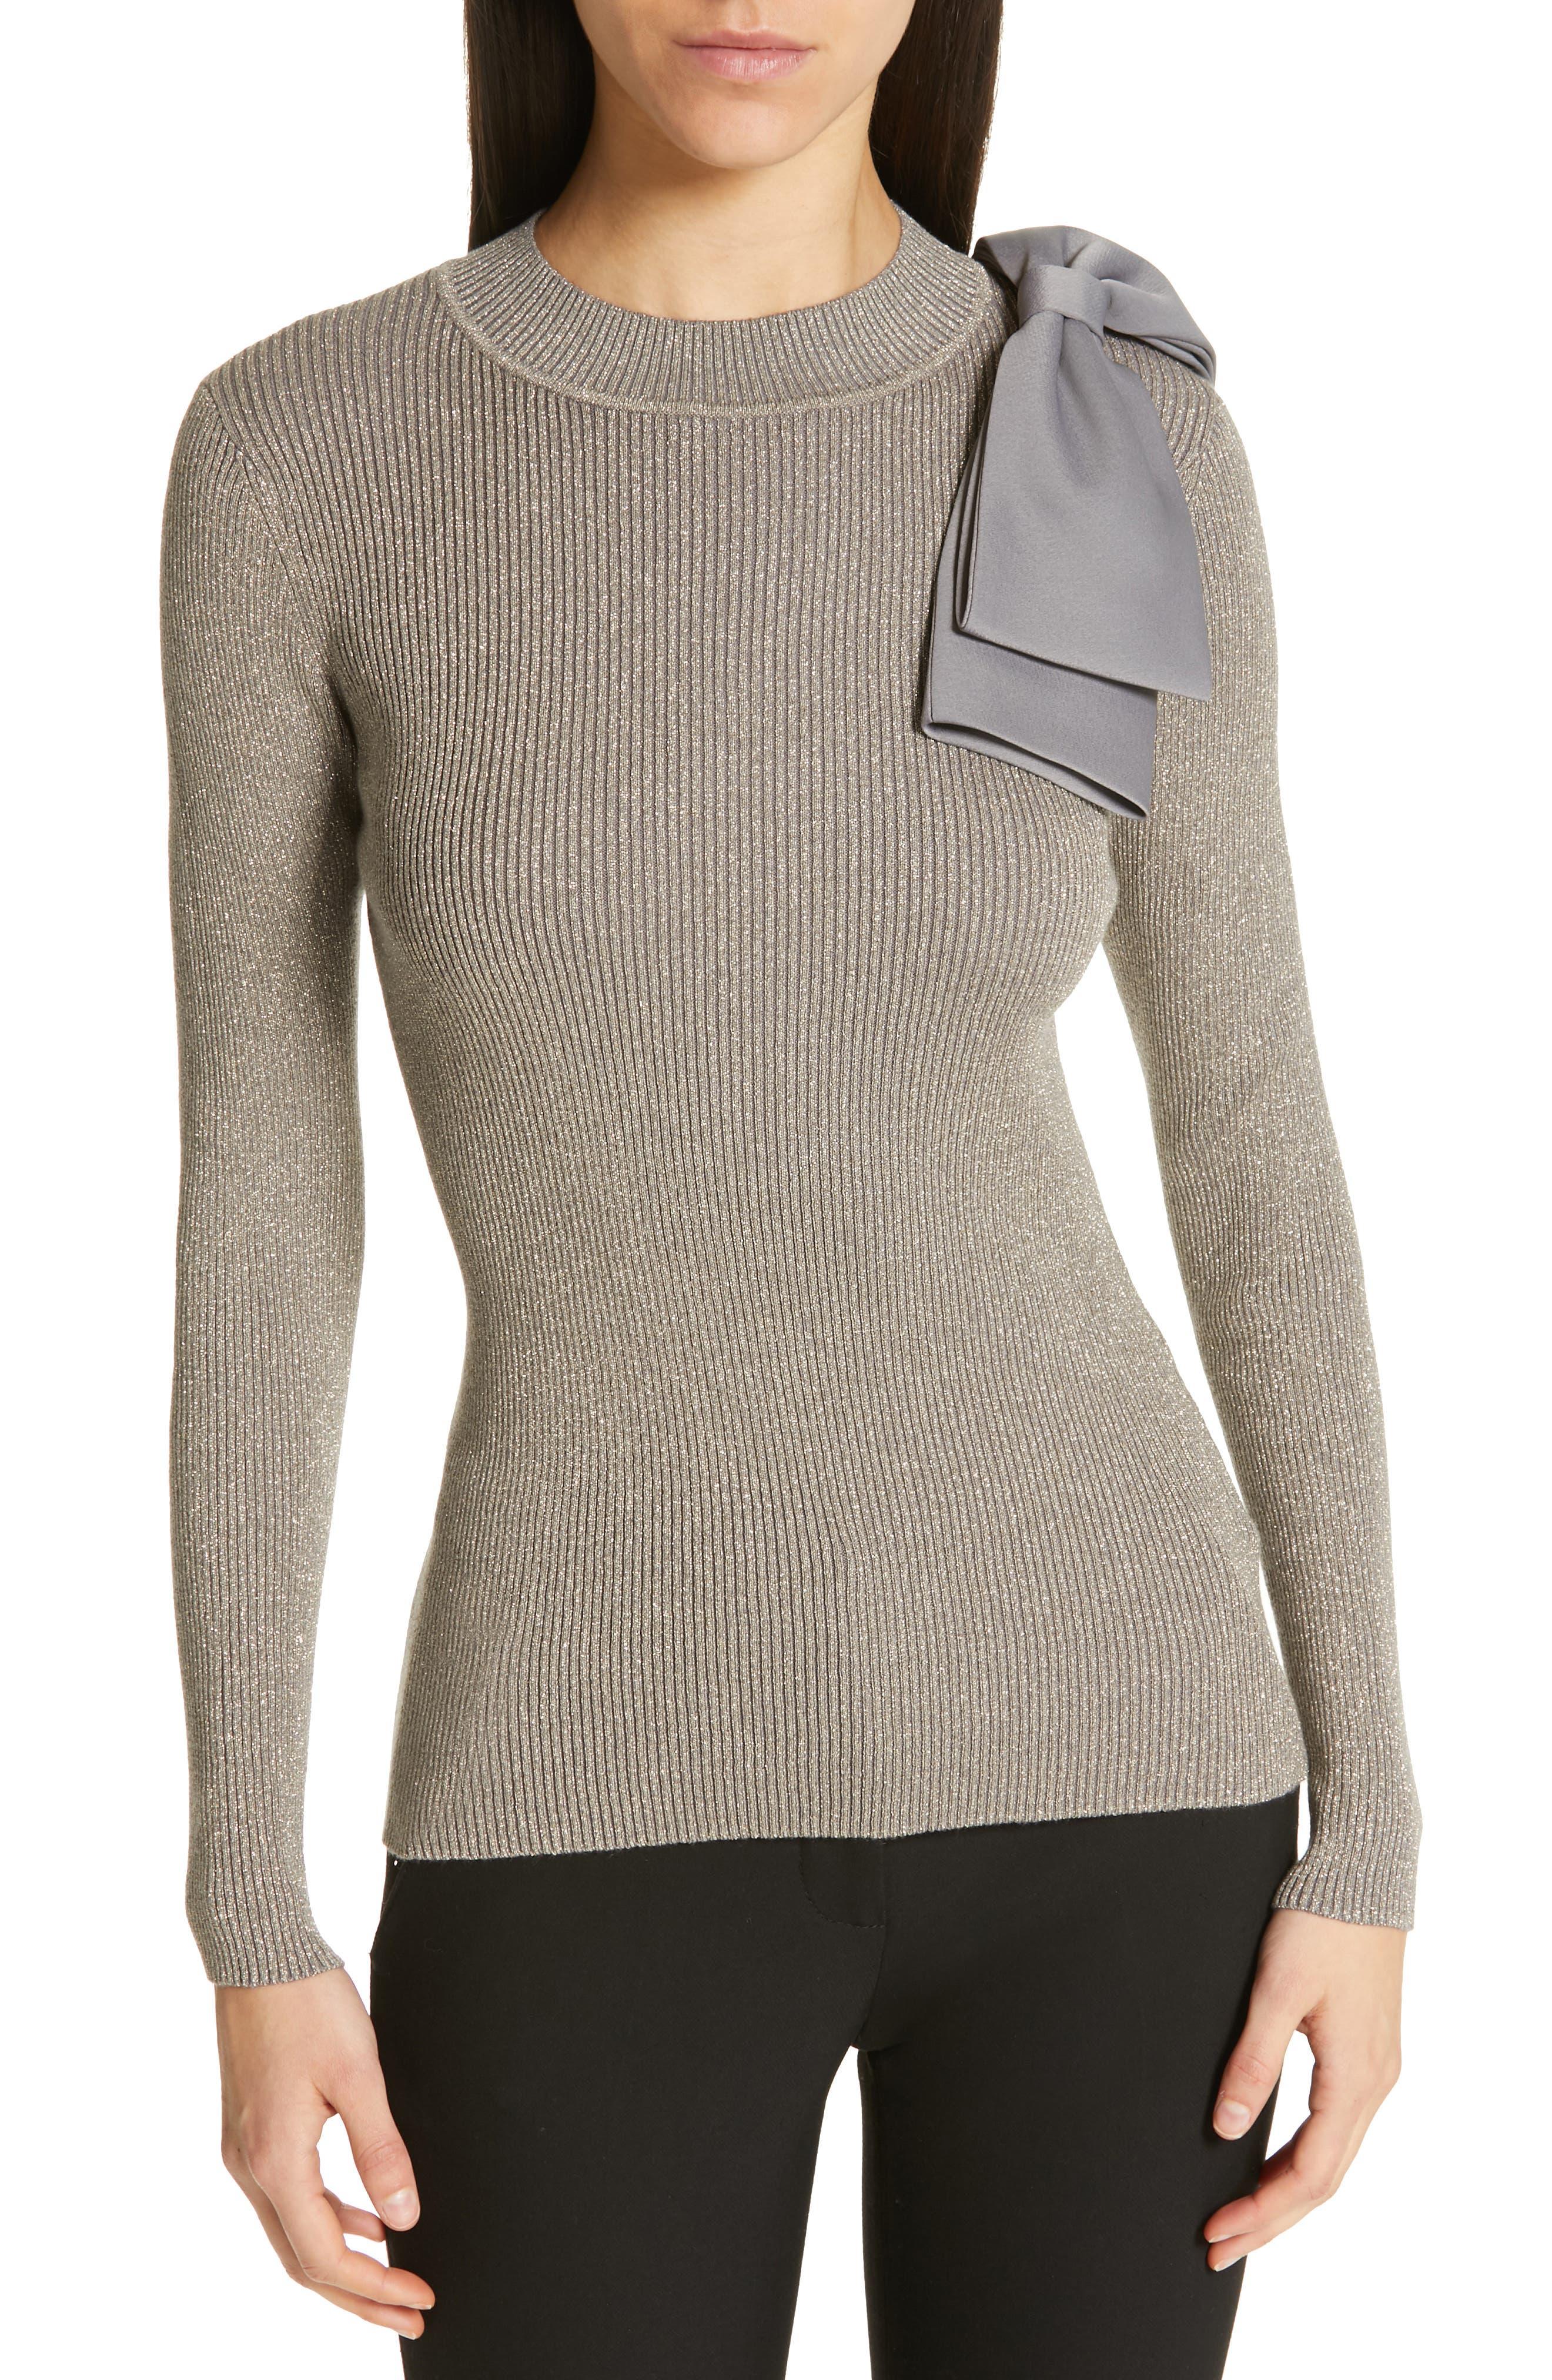 Saaydie Bow Trim Metallic Sweater,                             Main thumbnail 1, color,                             CHARCOAL